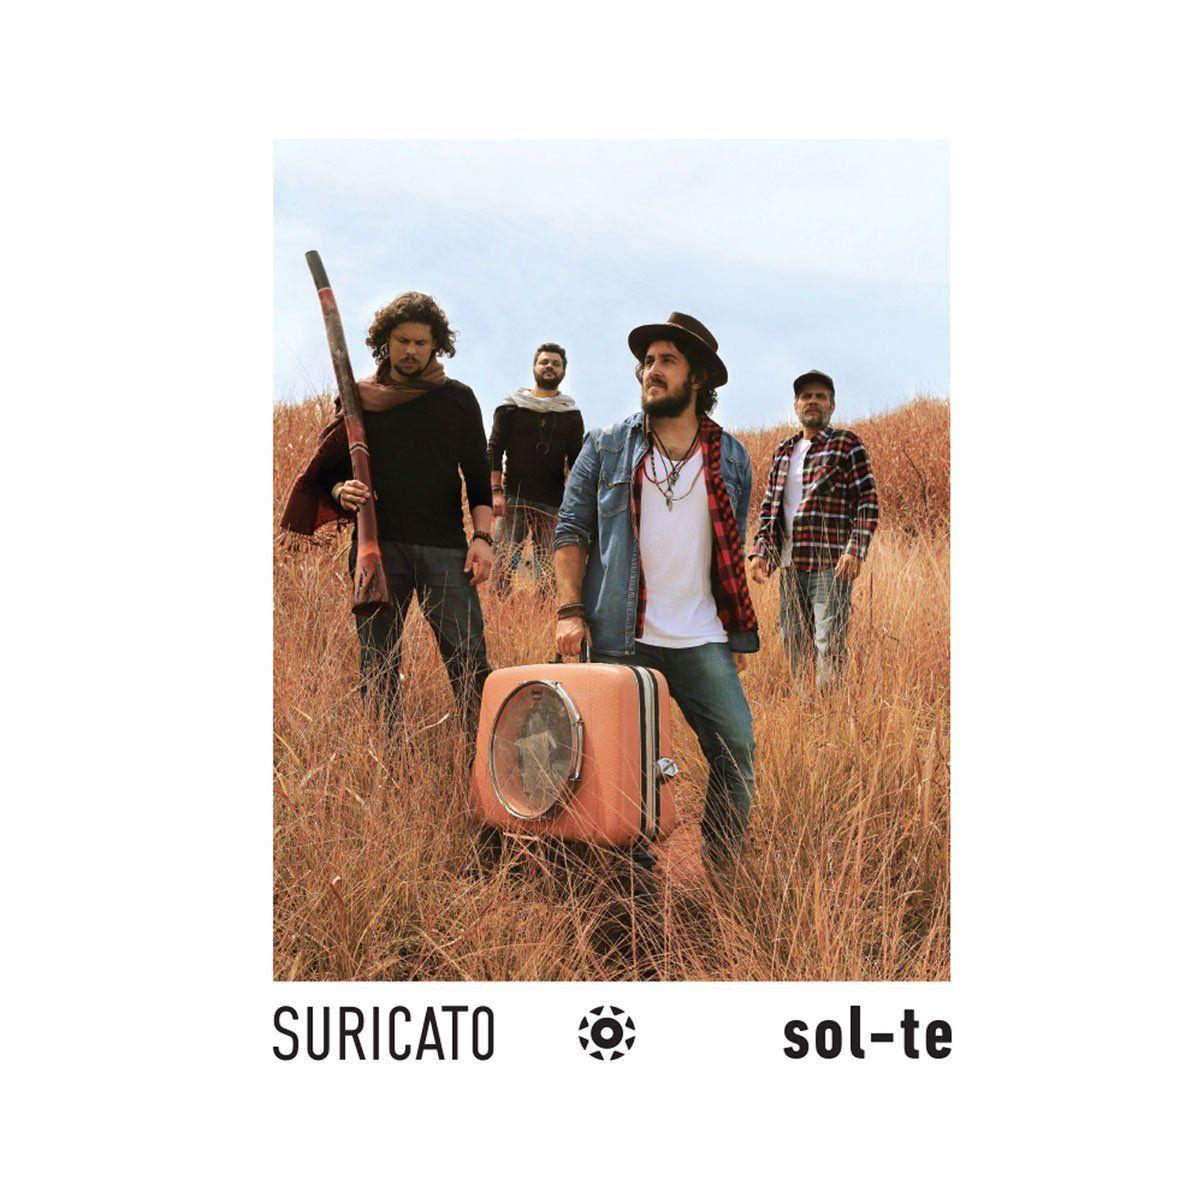 LP Suricato Sol-te  - bandUP Store Marketplace